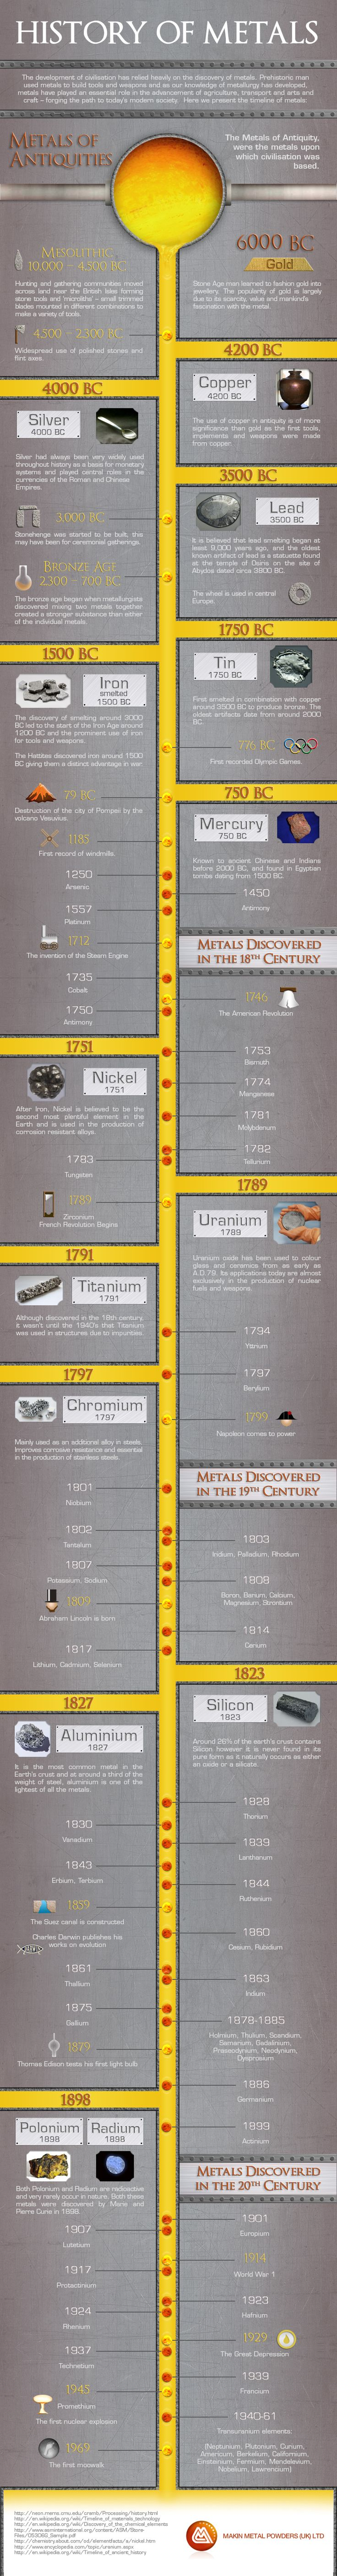 A Brief Visual History Of Metals | October 10, 2014, Tyler Durden, Zero Hedge: